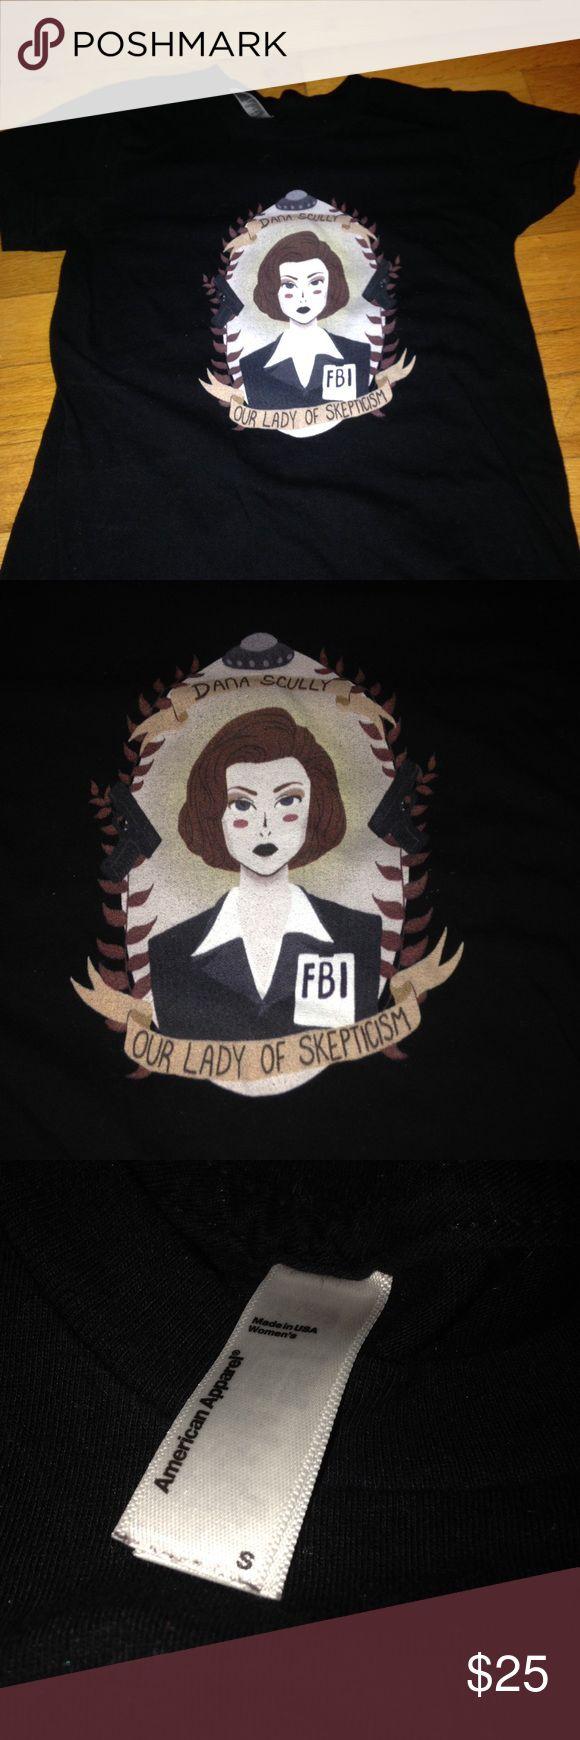 Dana Scully shirt Dana scully fbi txf short sleeve shirt American Apparel Tops Tees - Short Sleeve